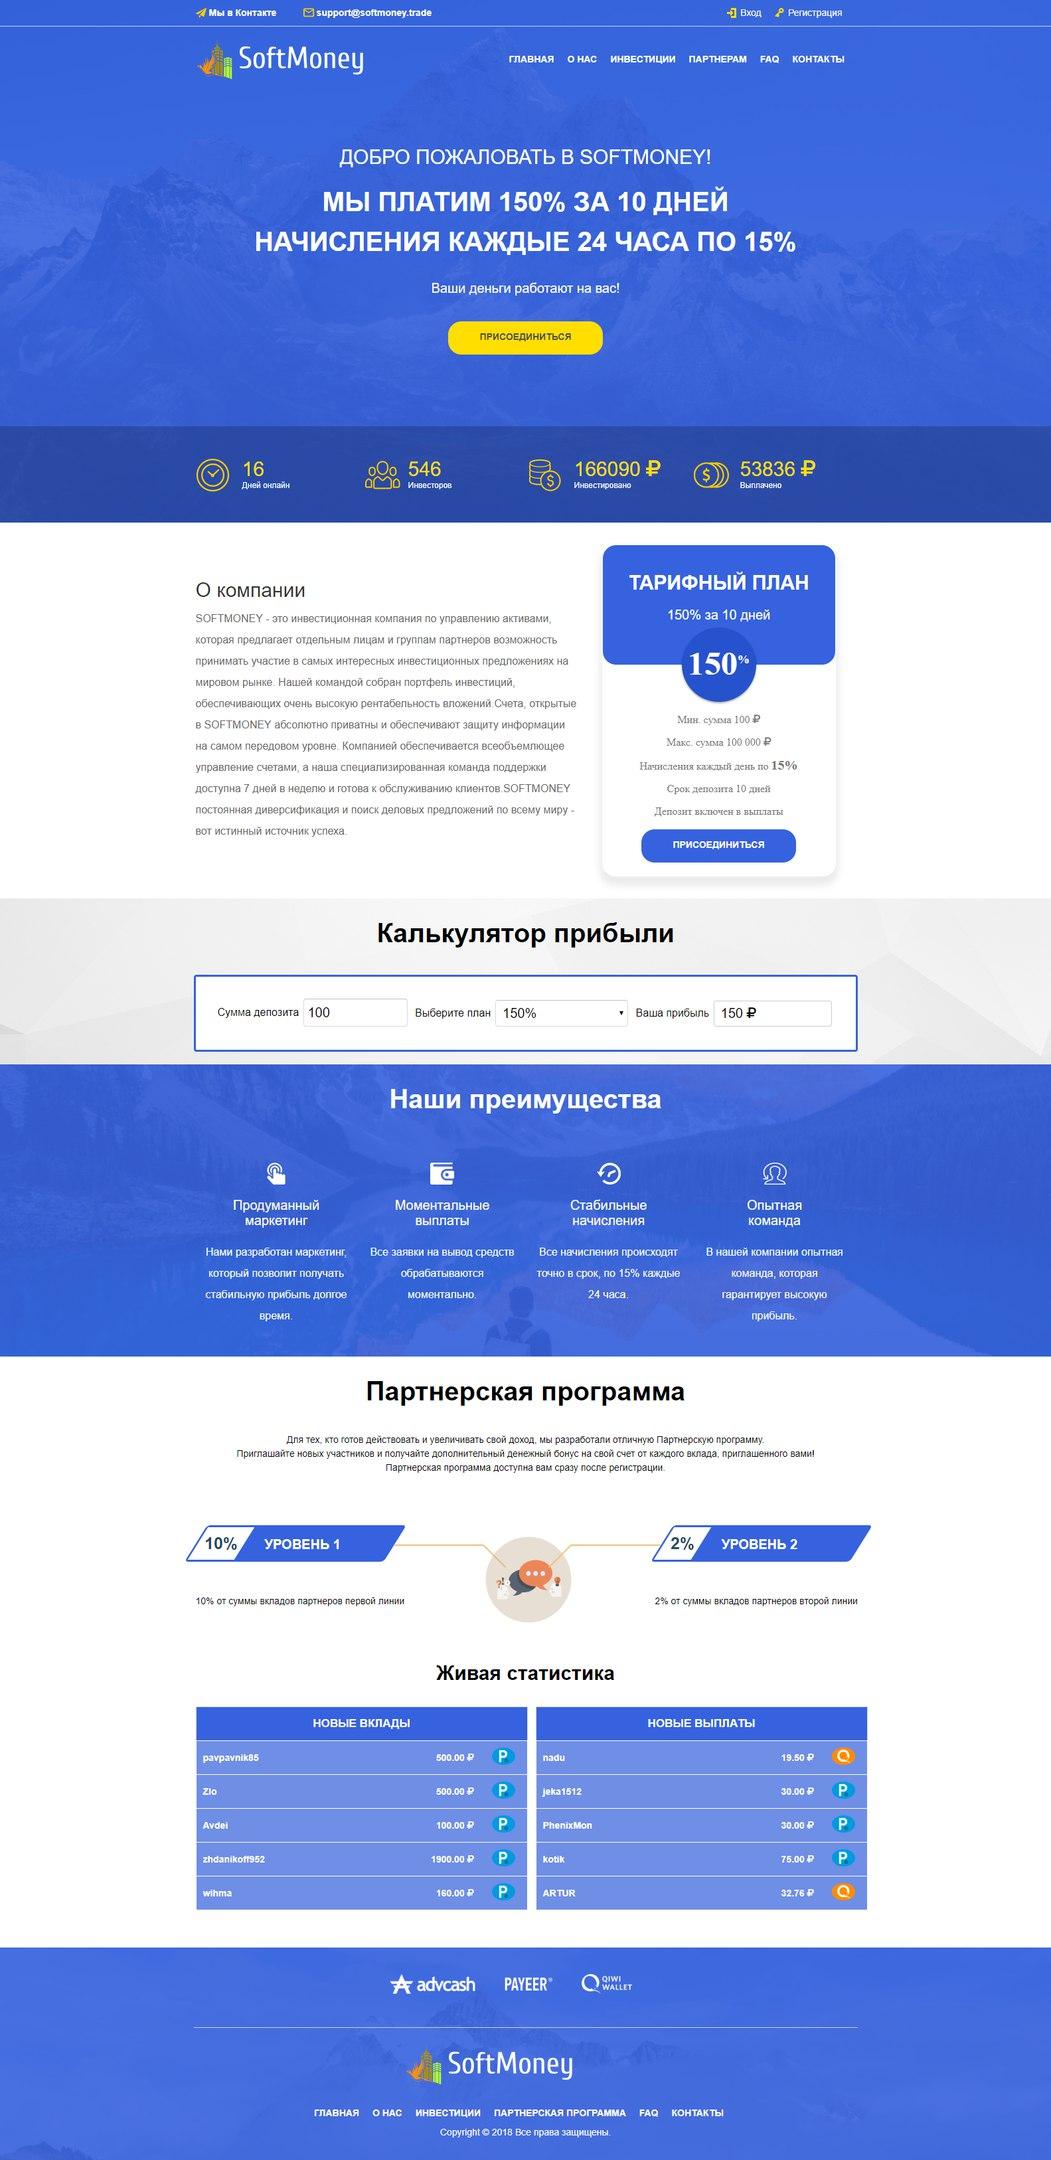 Скрипт хайп проекта SOFTMONEY